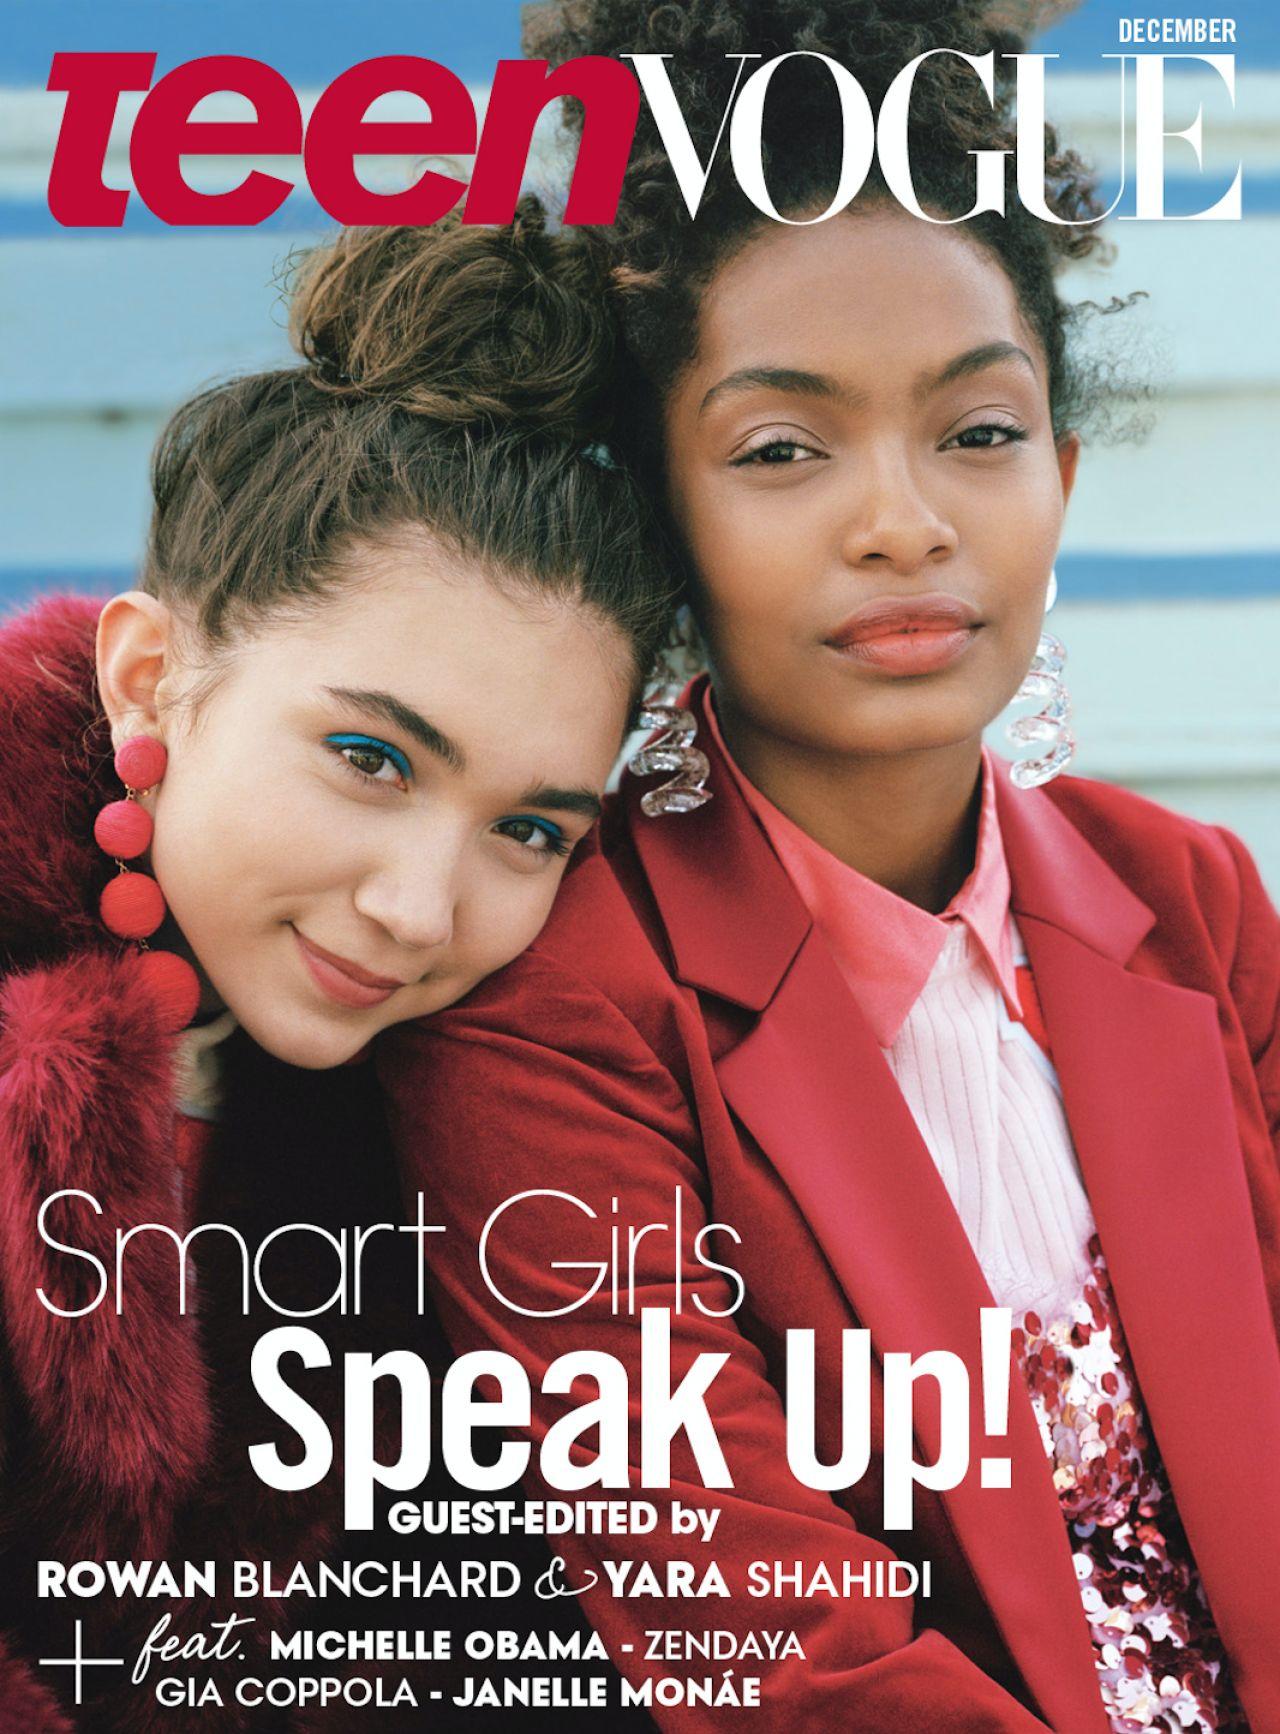 Teen Vogue - Twilight Series Photo (2325305) - Fanpop